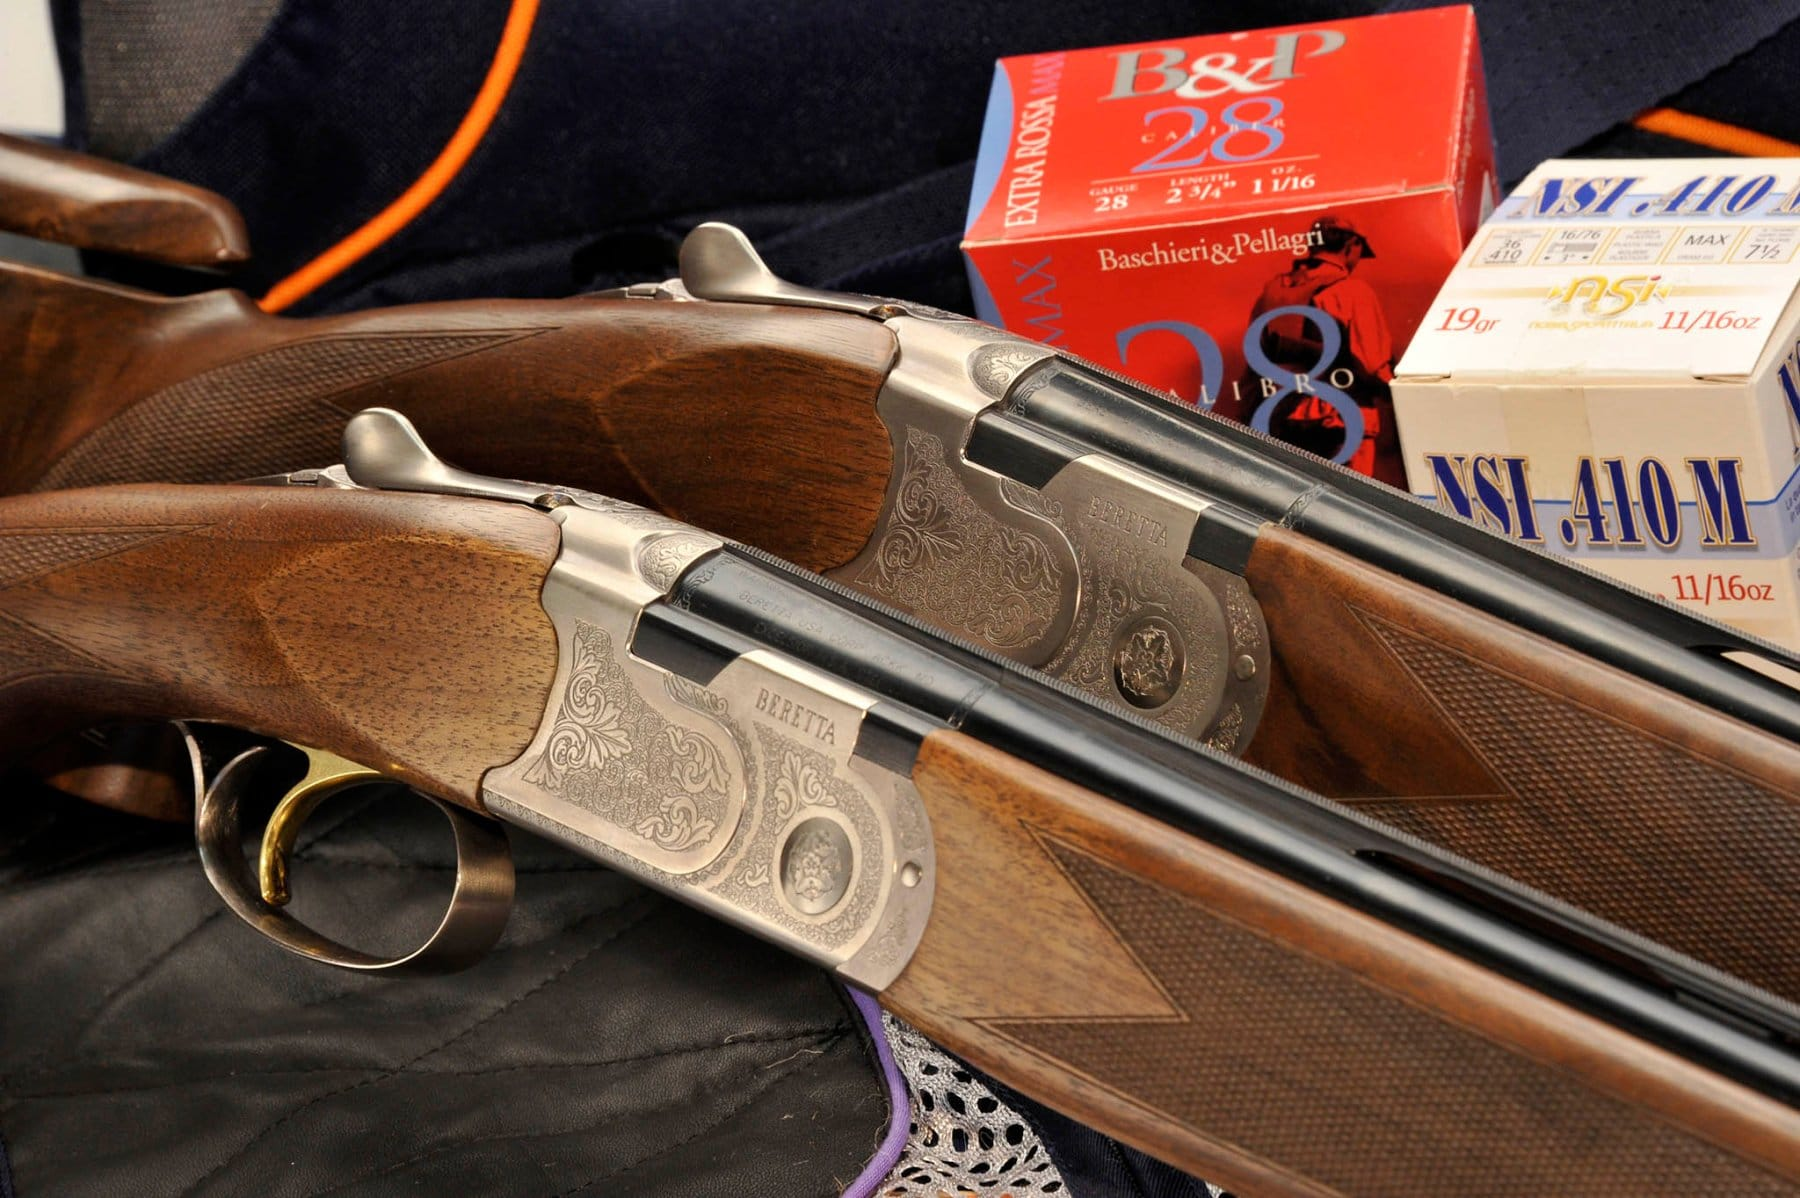 Beretta 686 Silver Pigeon1 или Benelli 828U Black: кто лучше?